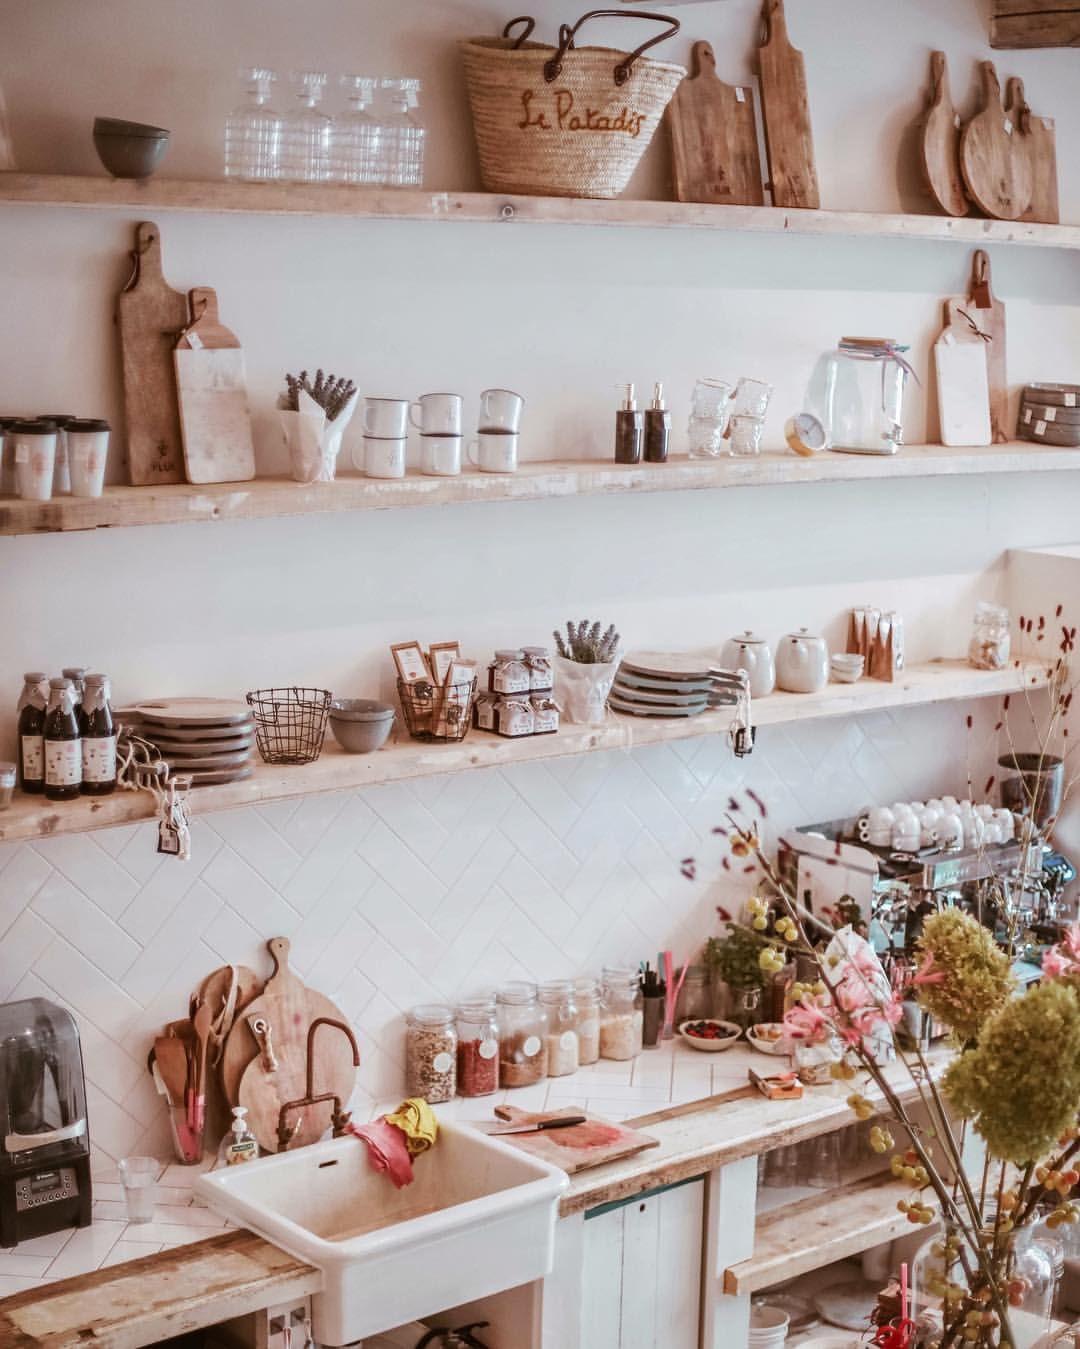 thesematters mymatters amsterdam kitchen interior goals kinfolk slow living home design - Slow Home Design